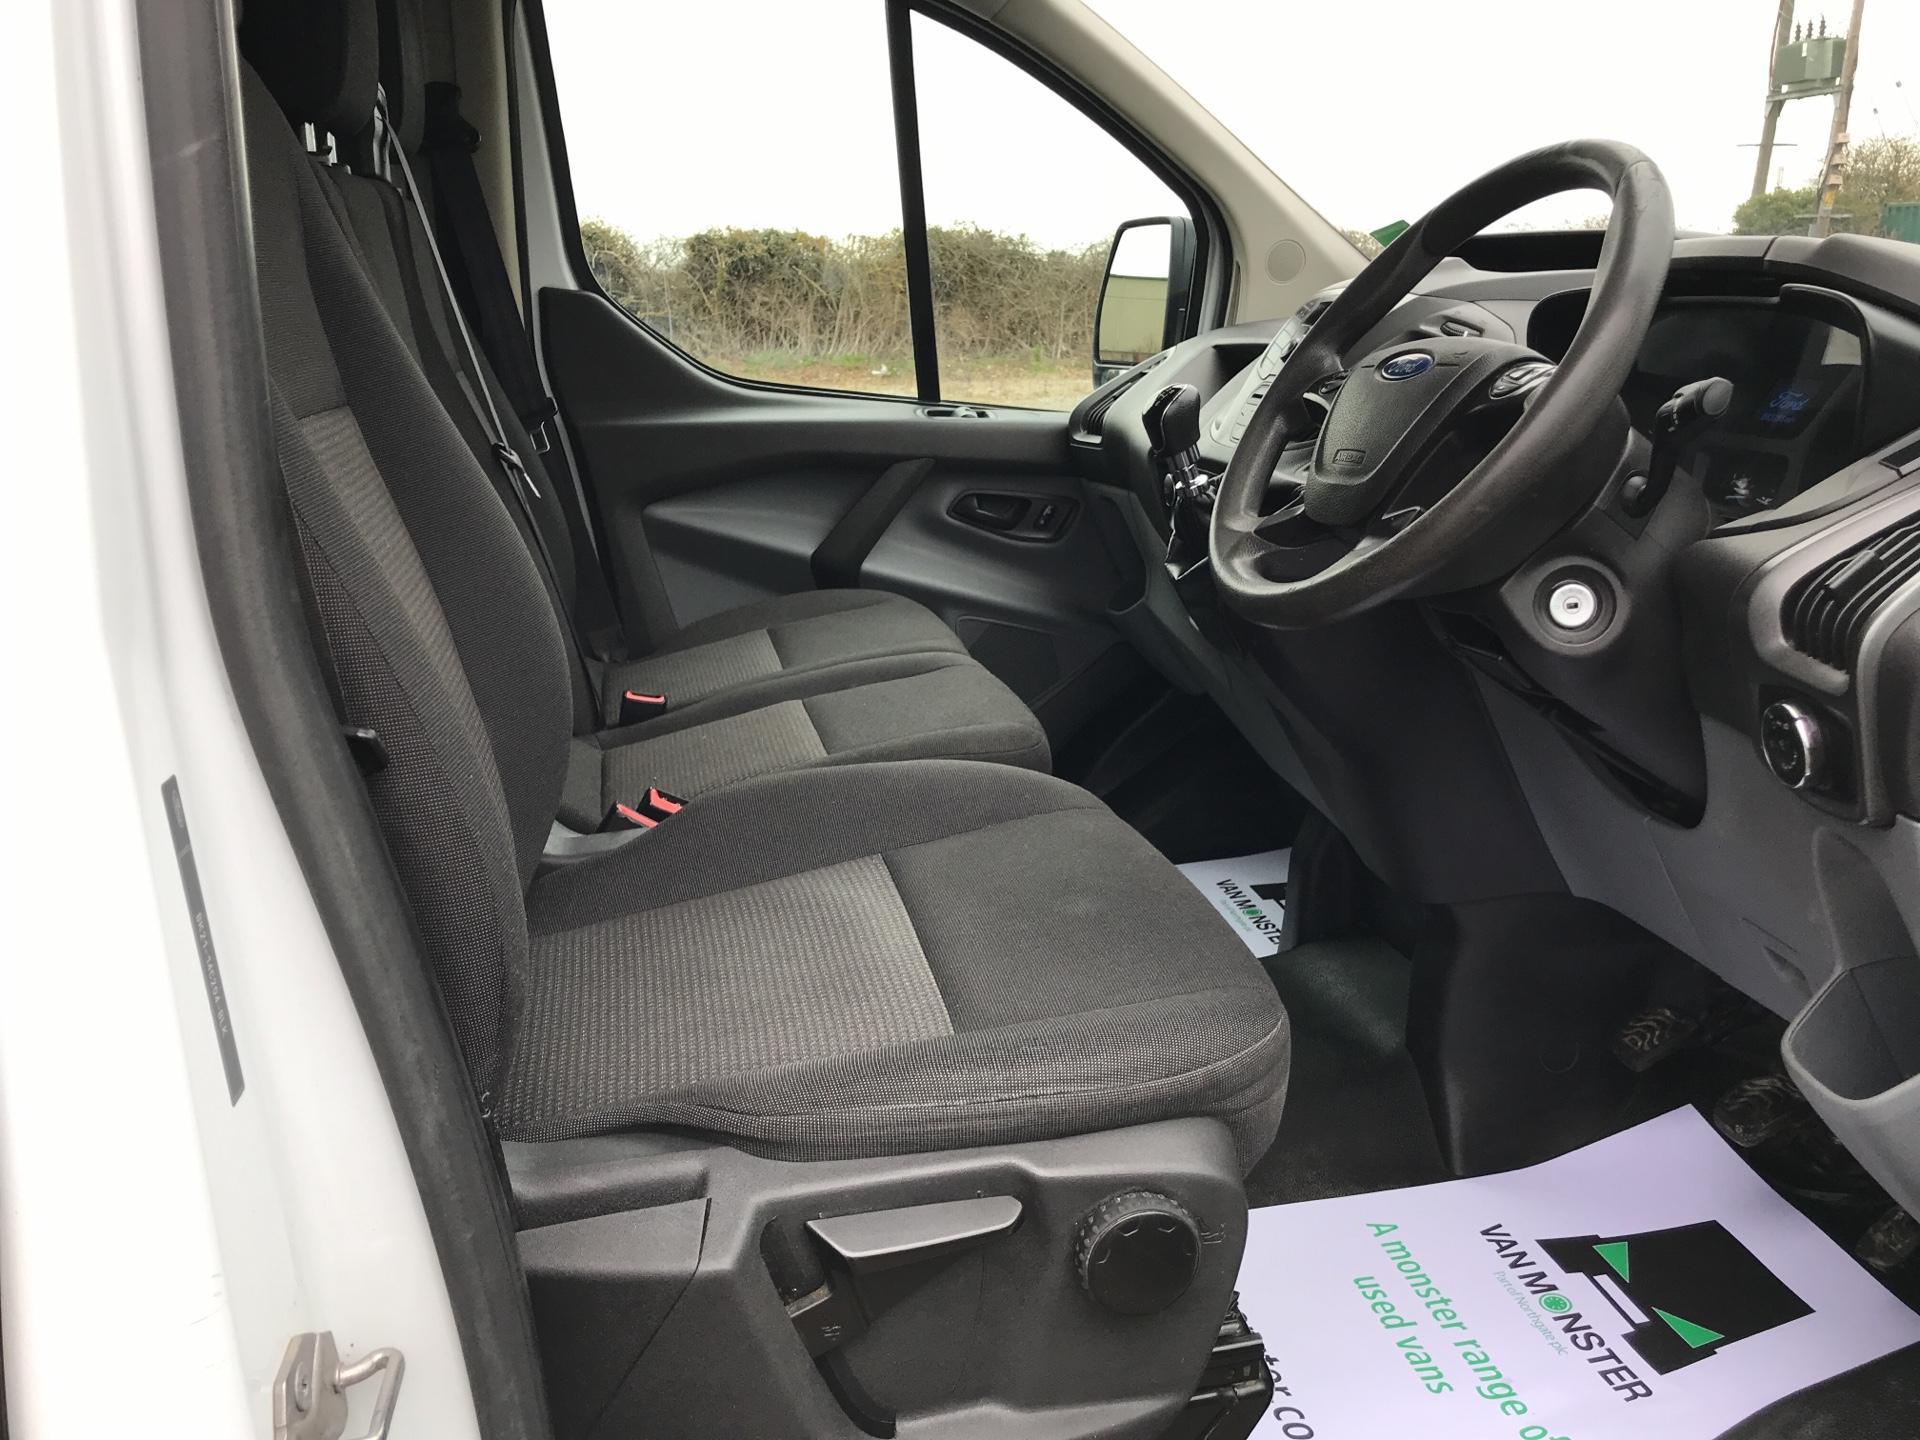 2014 Ford Transit Custom 290 L1 DIESEL FWD 2.2 TDCI 100PS LOW ROOF EURO 5 (NJ64MJO) Image 9